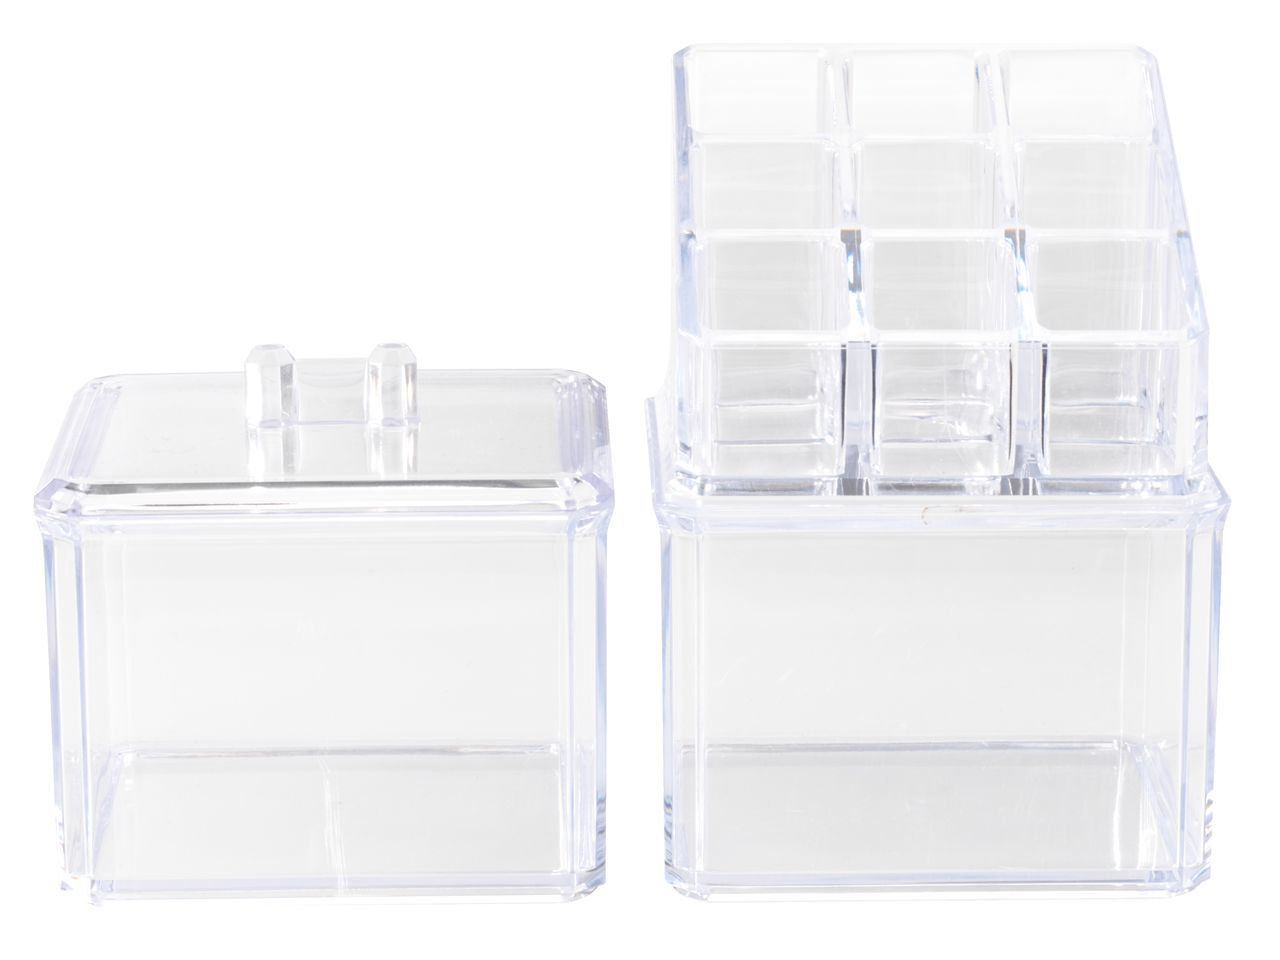 Sminkförvaring BRANTEVIK B11xL10xH21cm  889150e12004b